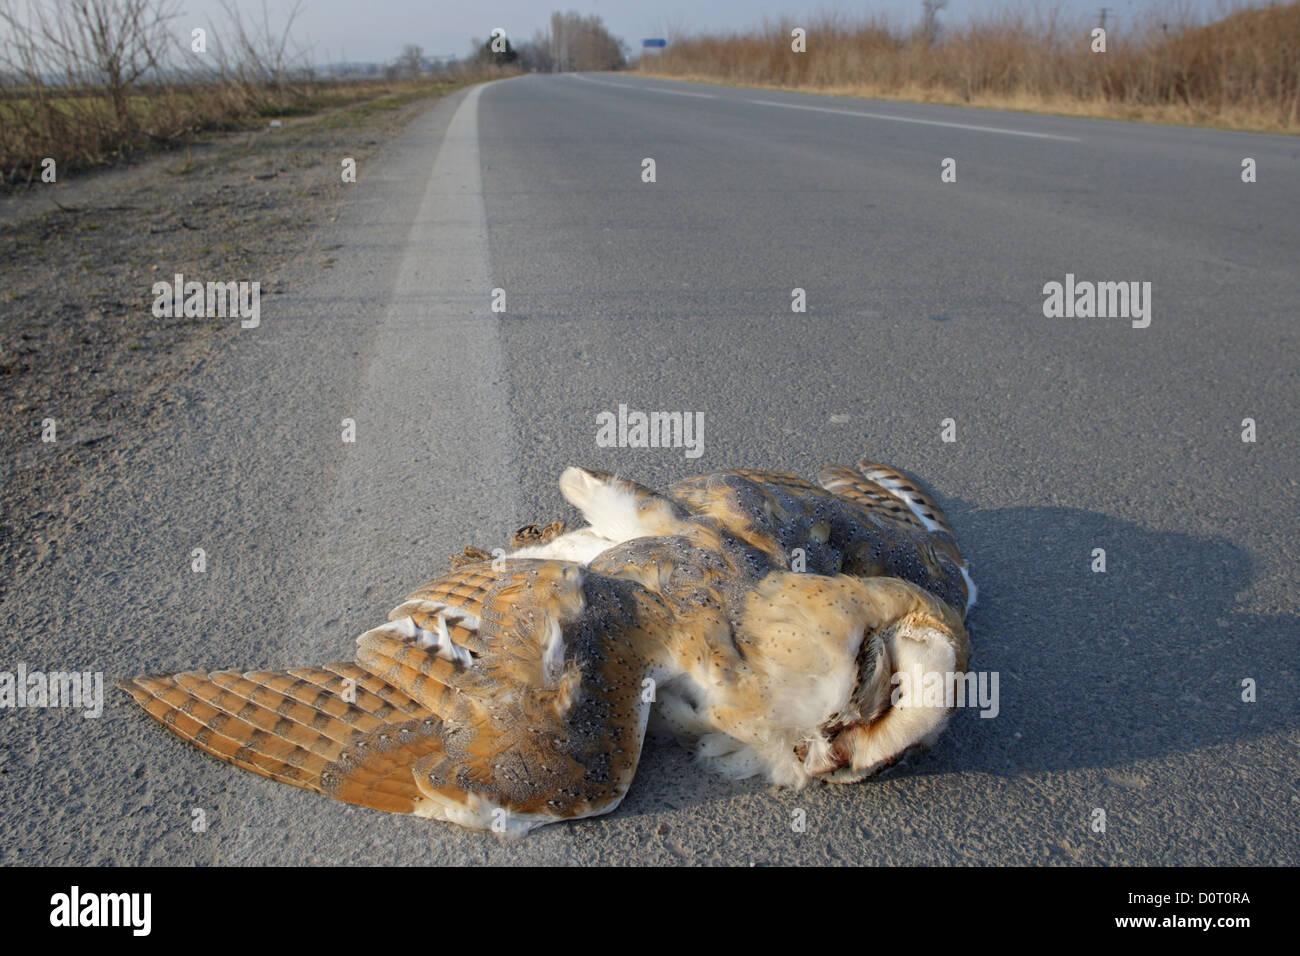 dead bird on the road,traffic victim, Bulgaria - Stock Image